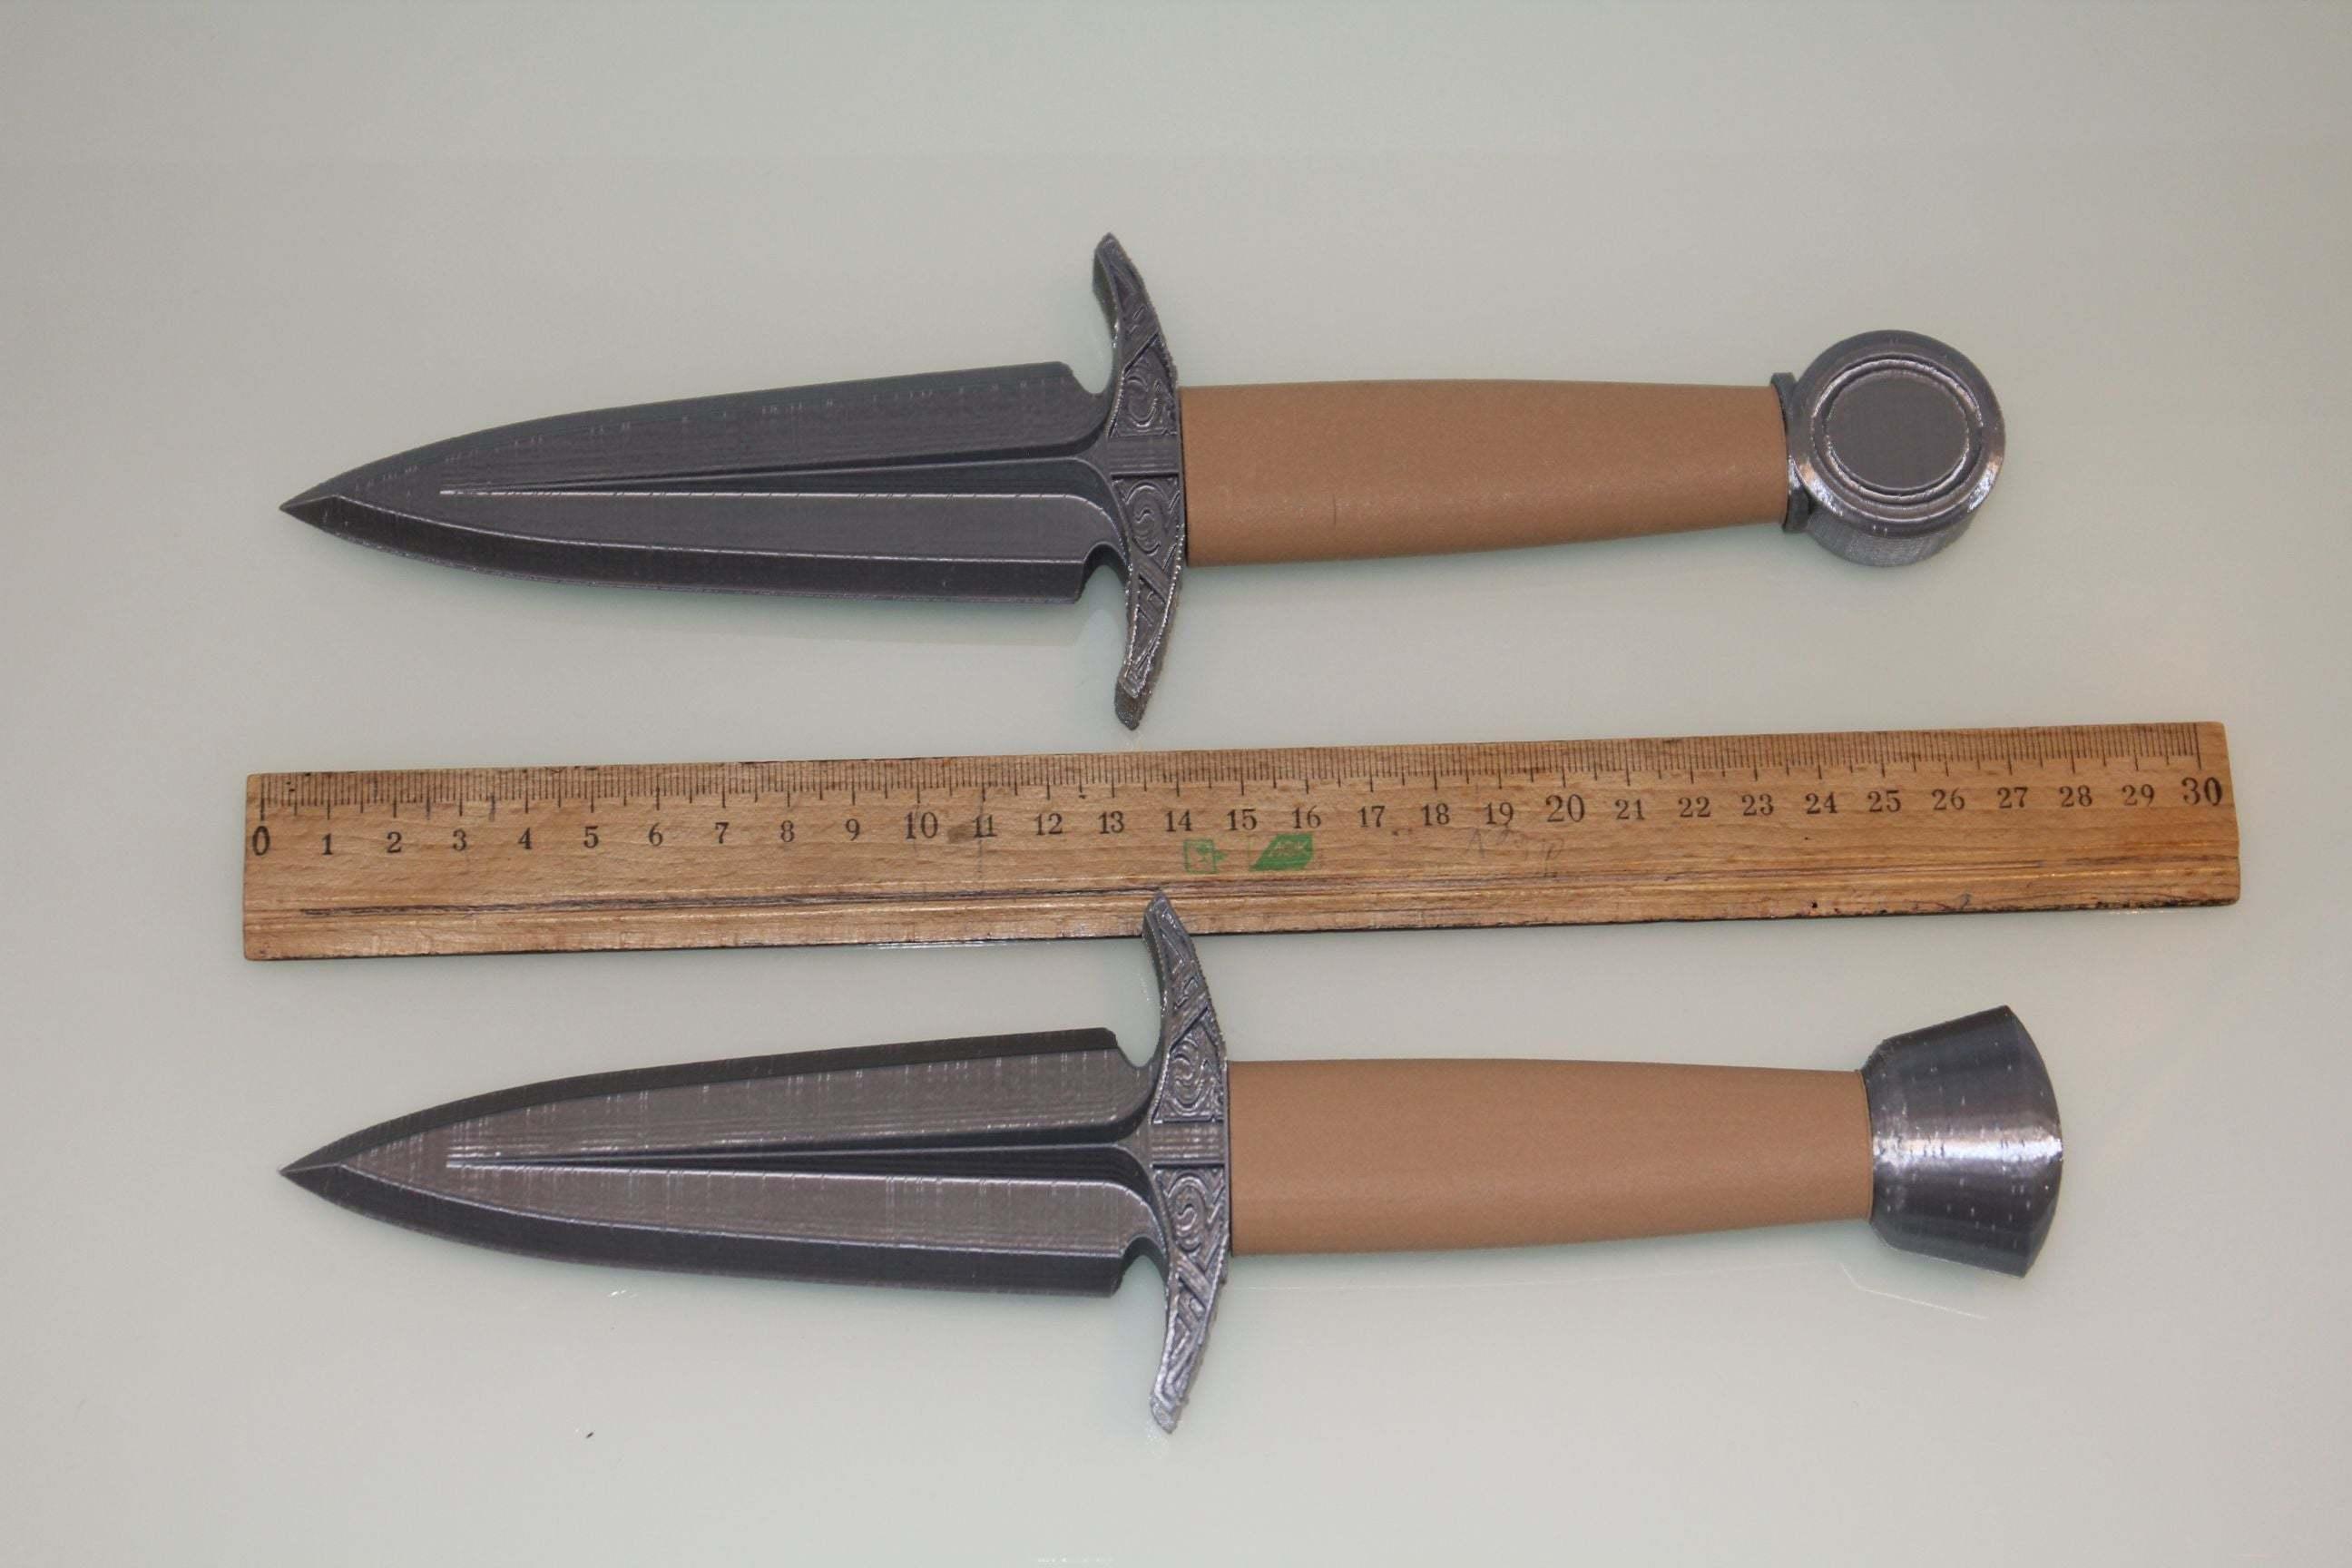 dagger10.jpg Download free STL file Dagger - easy to print, no support • 3D printable model, plokr